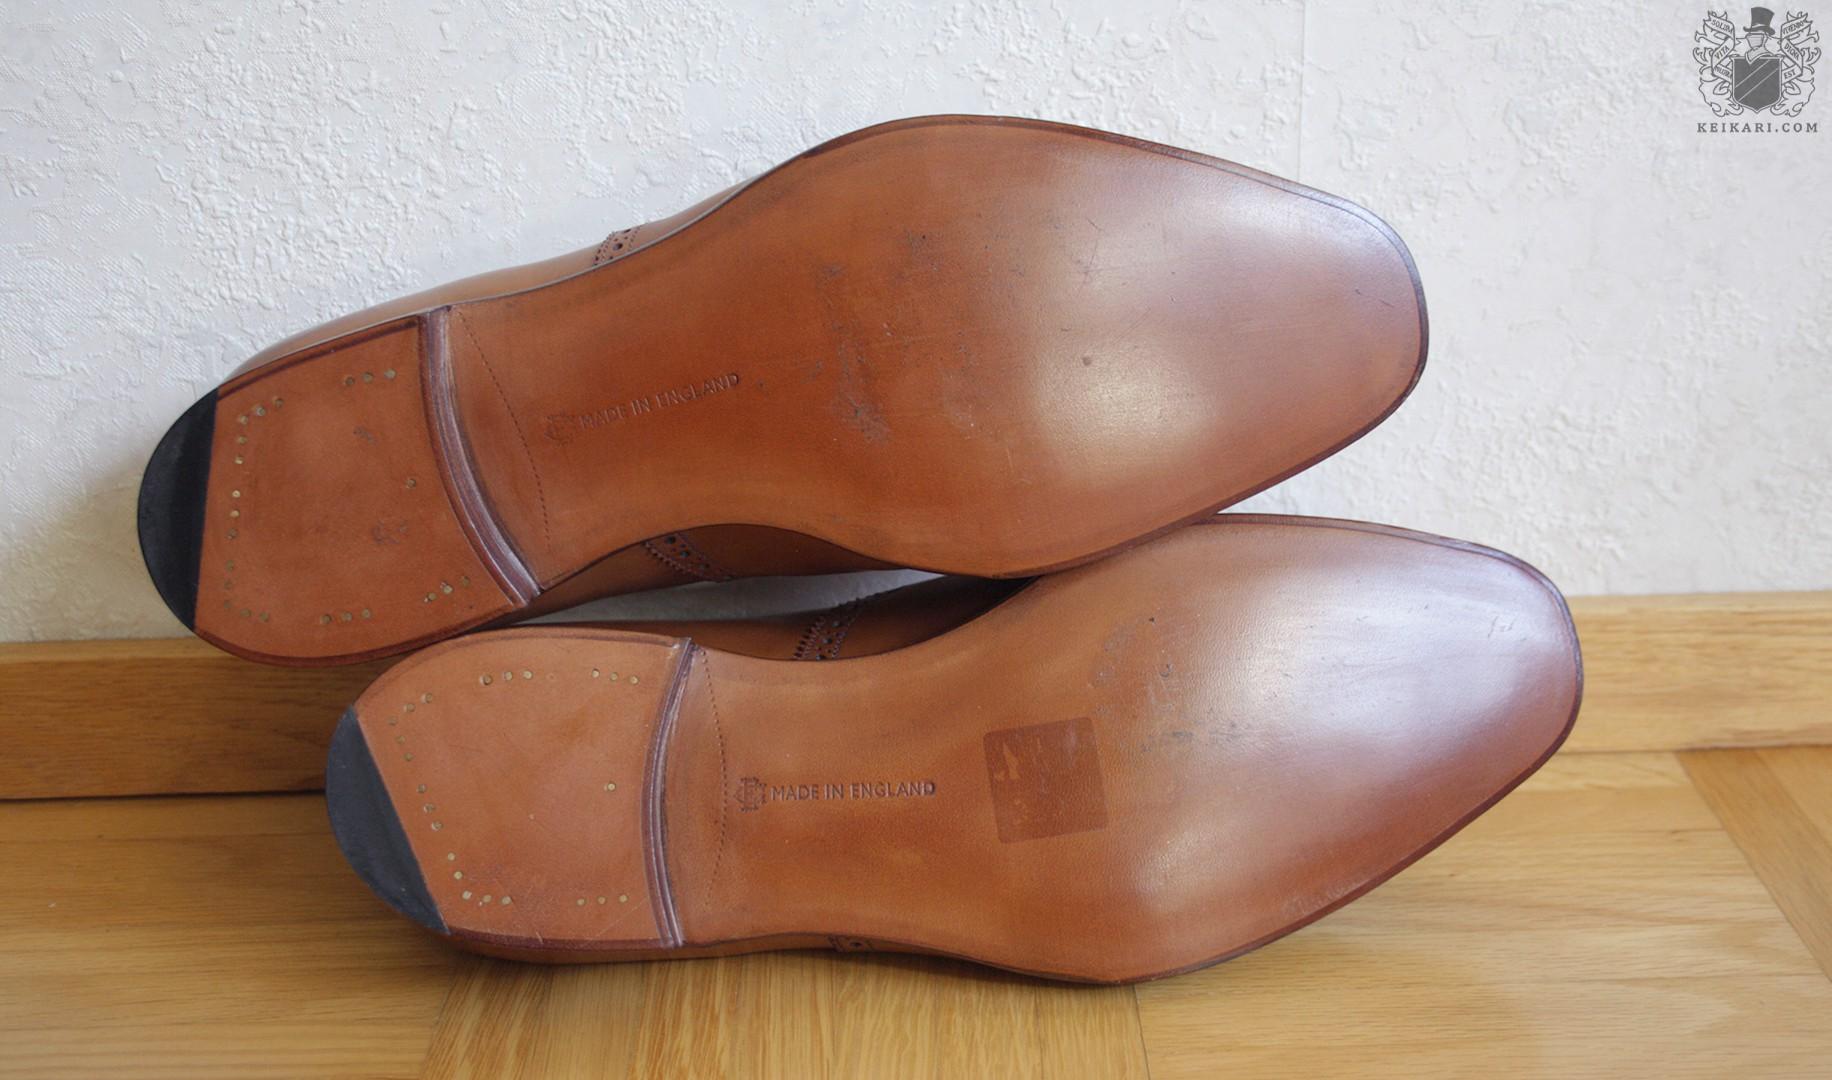 edward_green_kibworth_side_elastic_shoes_at_keikari_dot_com15